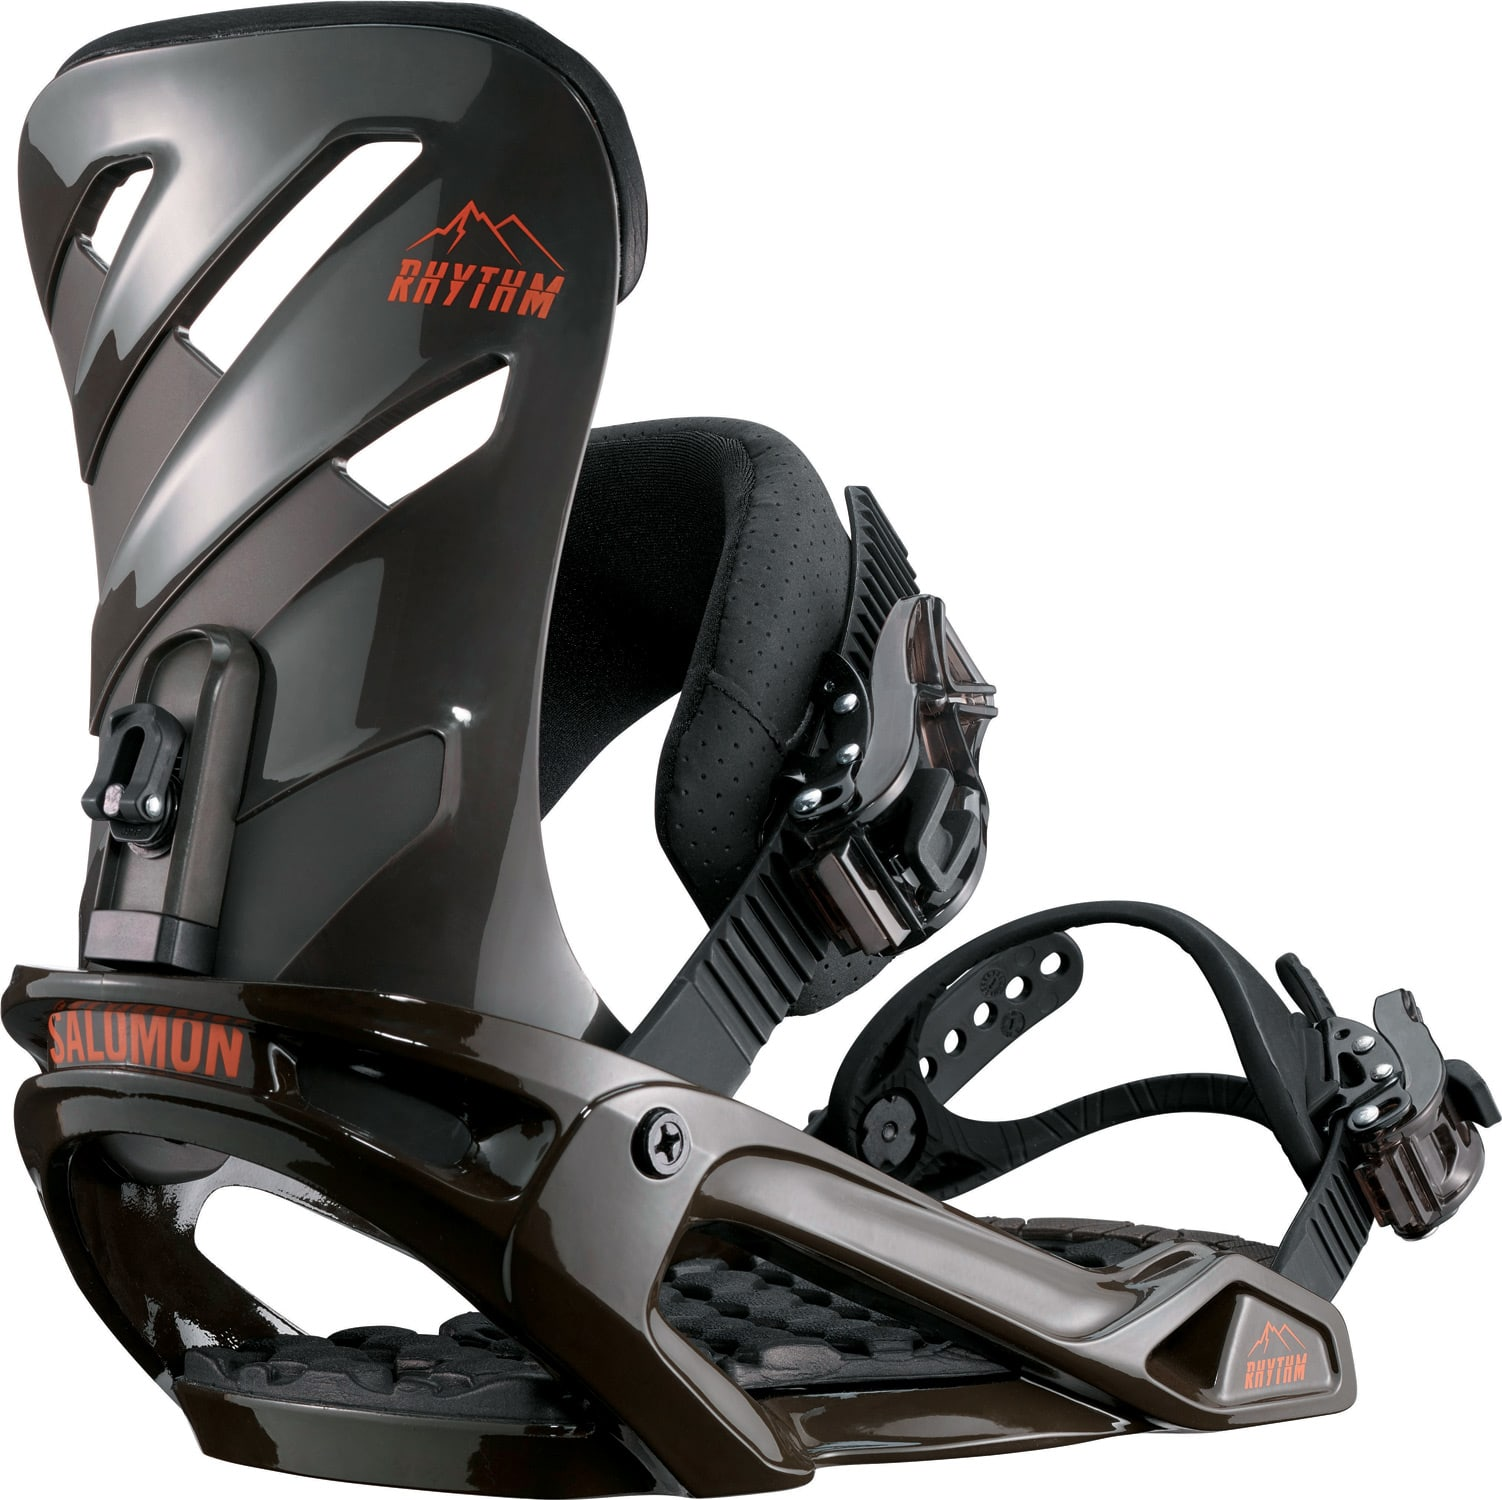 Salomon Rhythm Snowboard Bindings